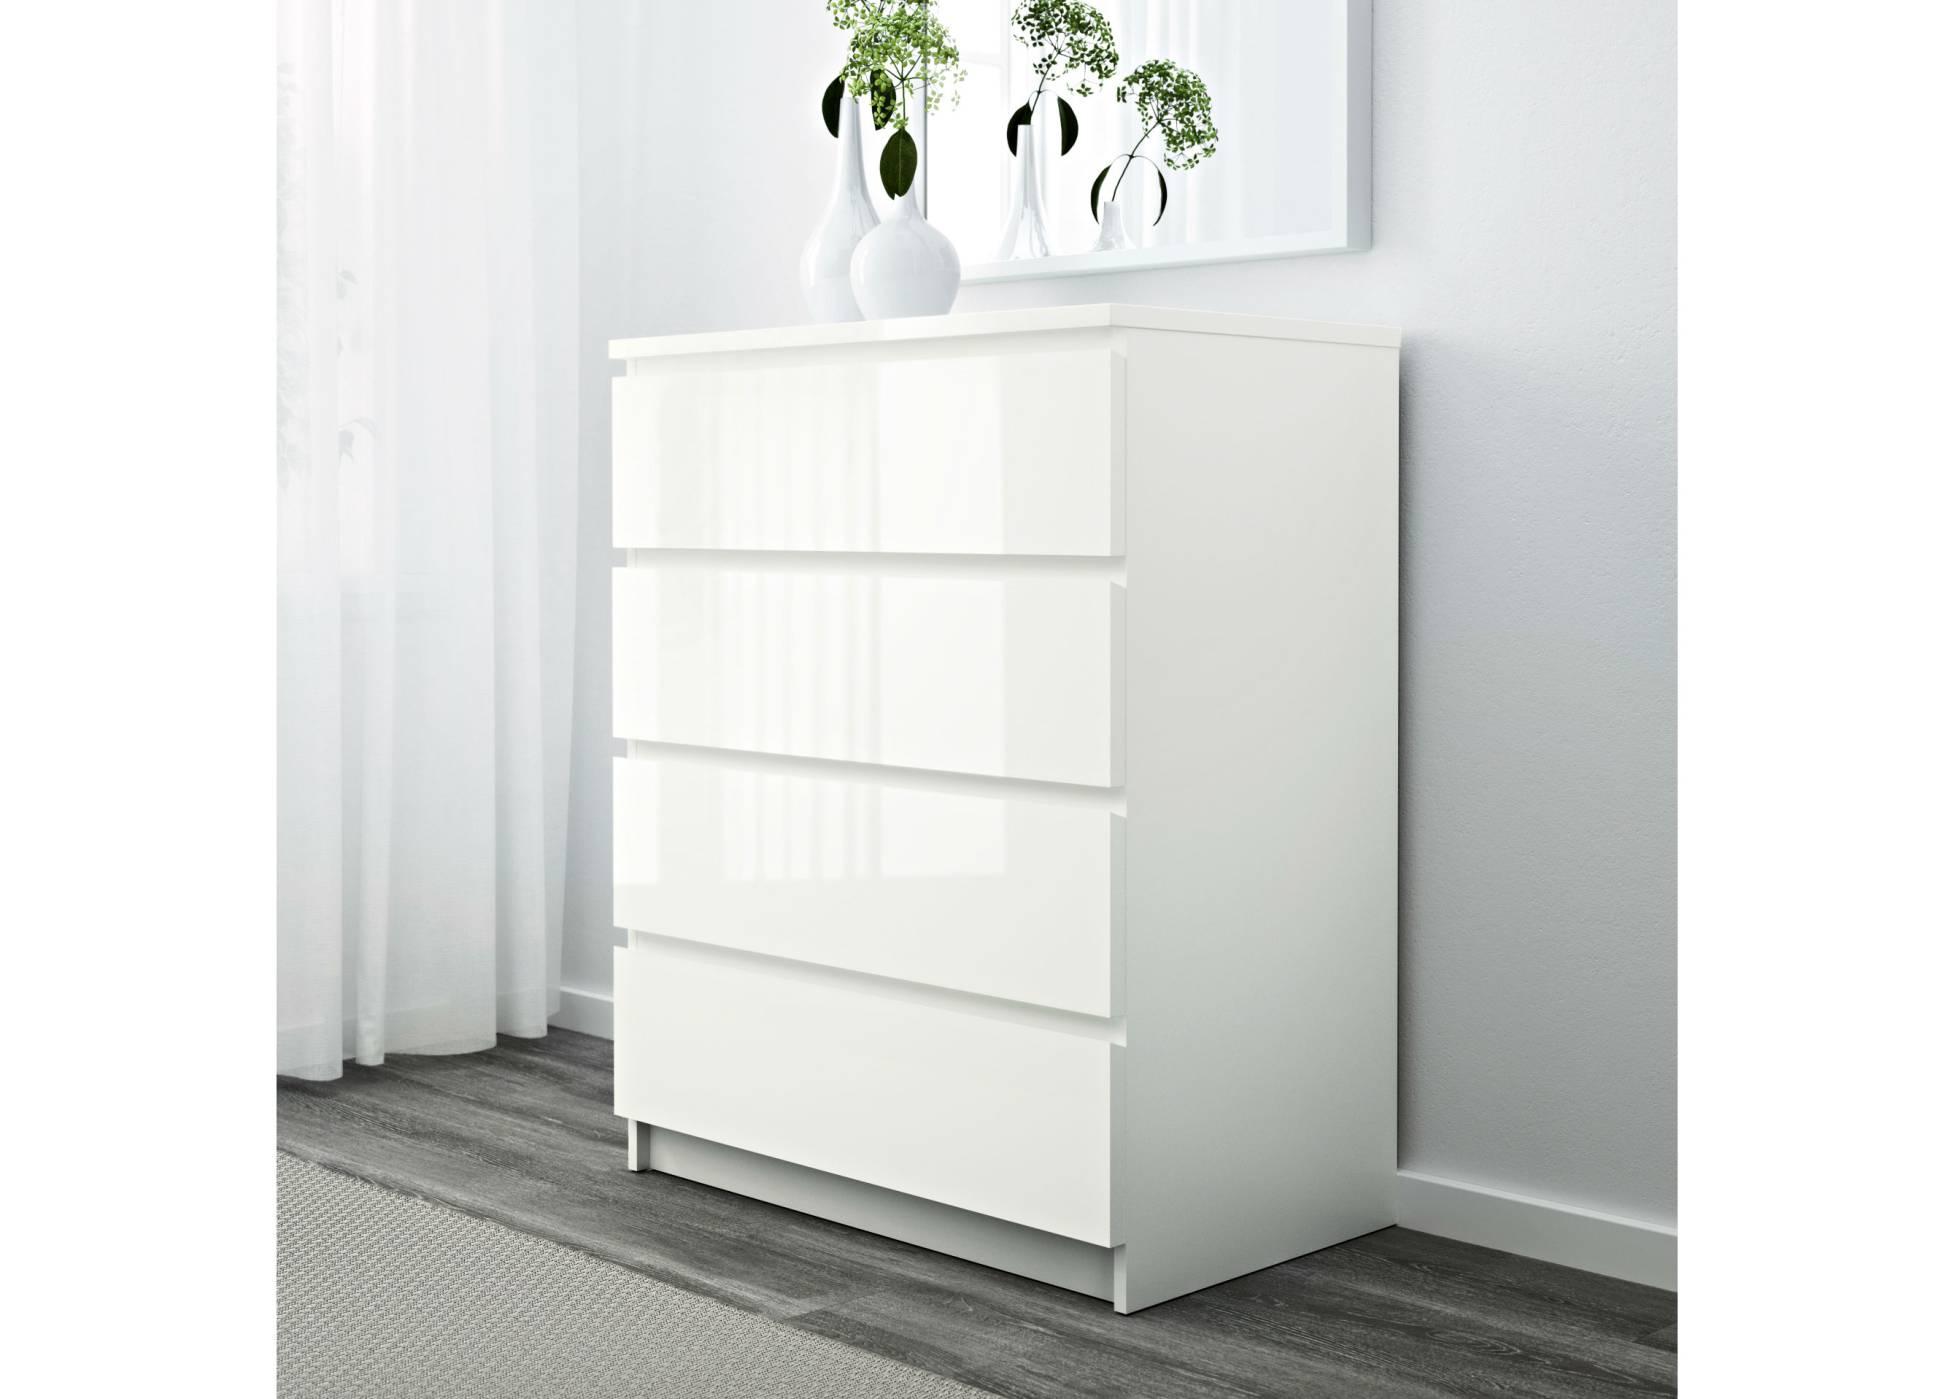 Arredare casa con mobili ikea idealista news for Cassettiera settimanale ikea